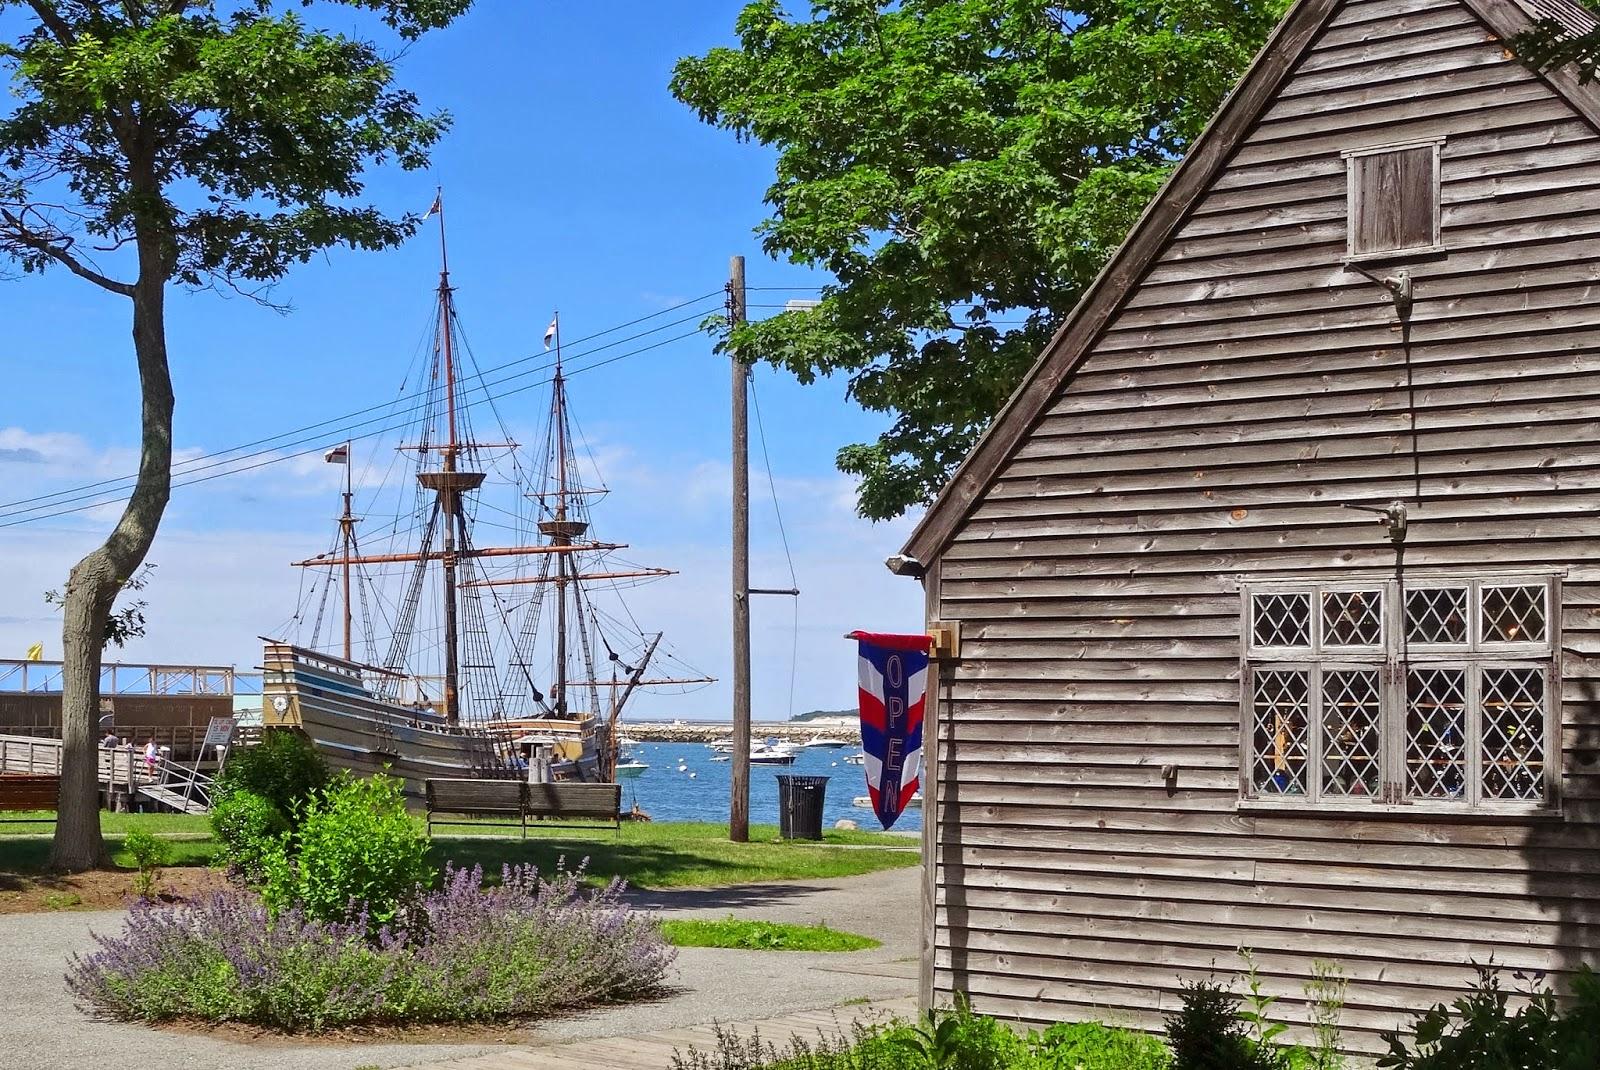 Joe S Retirement Blog Waterfront Plymouth Massachusetts